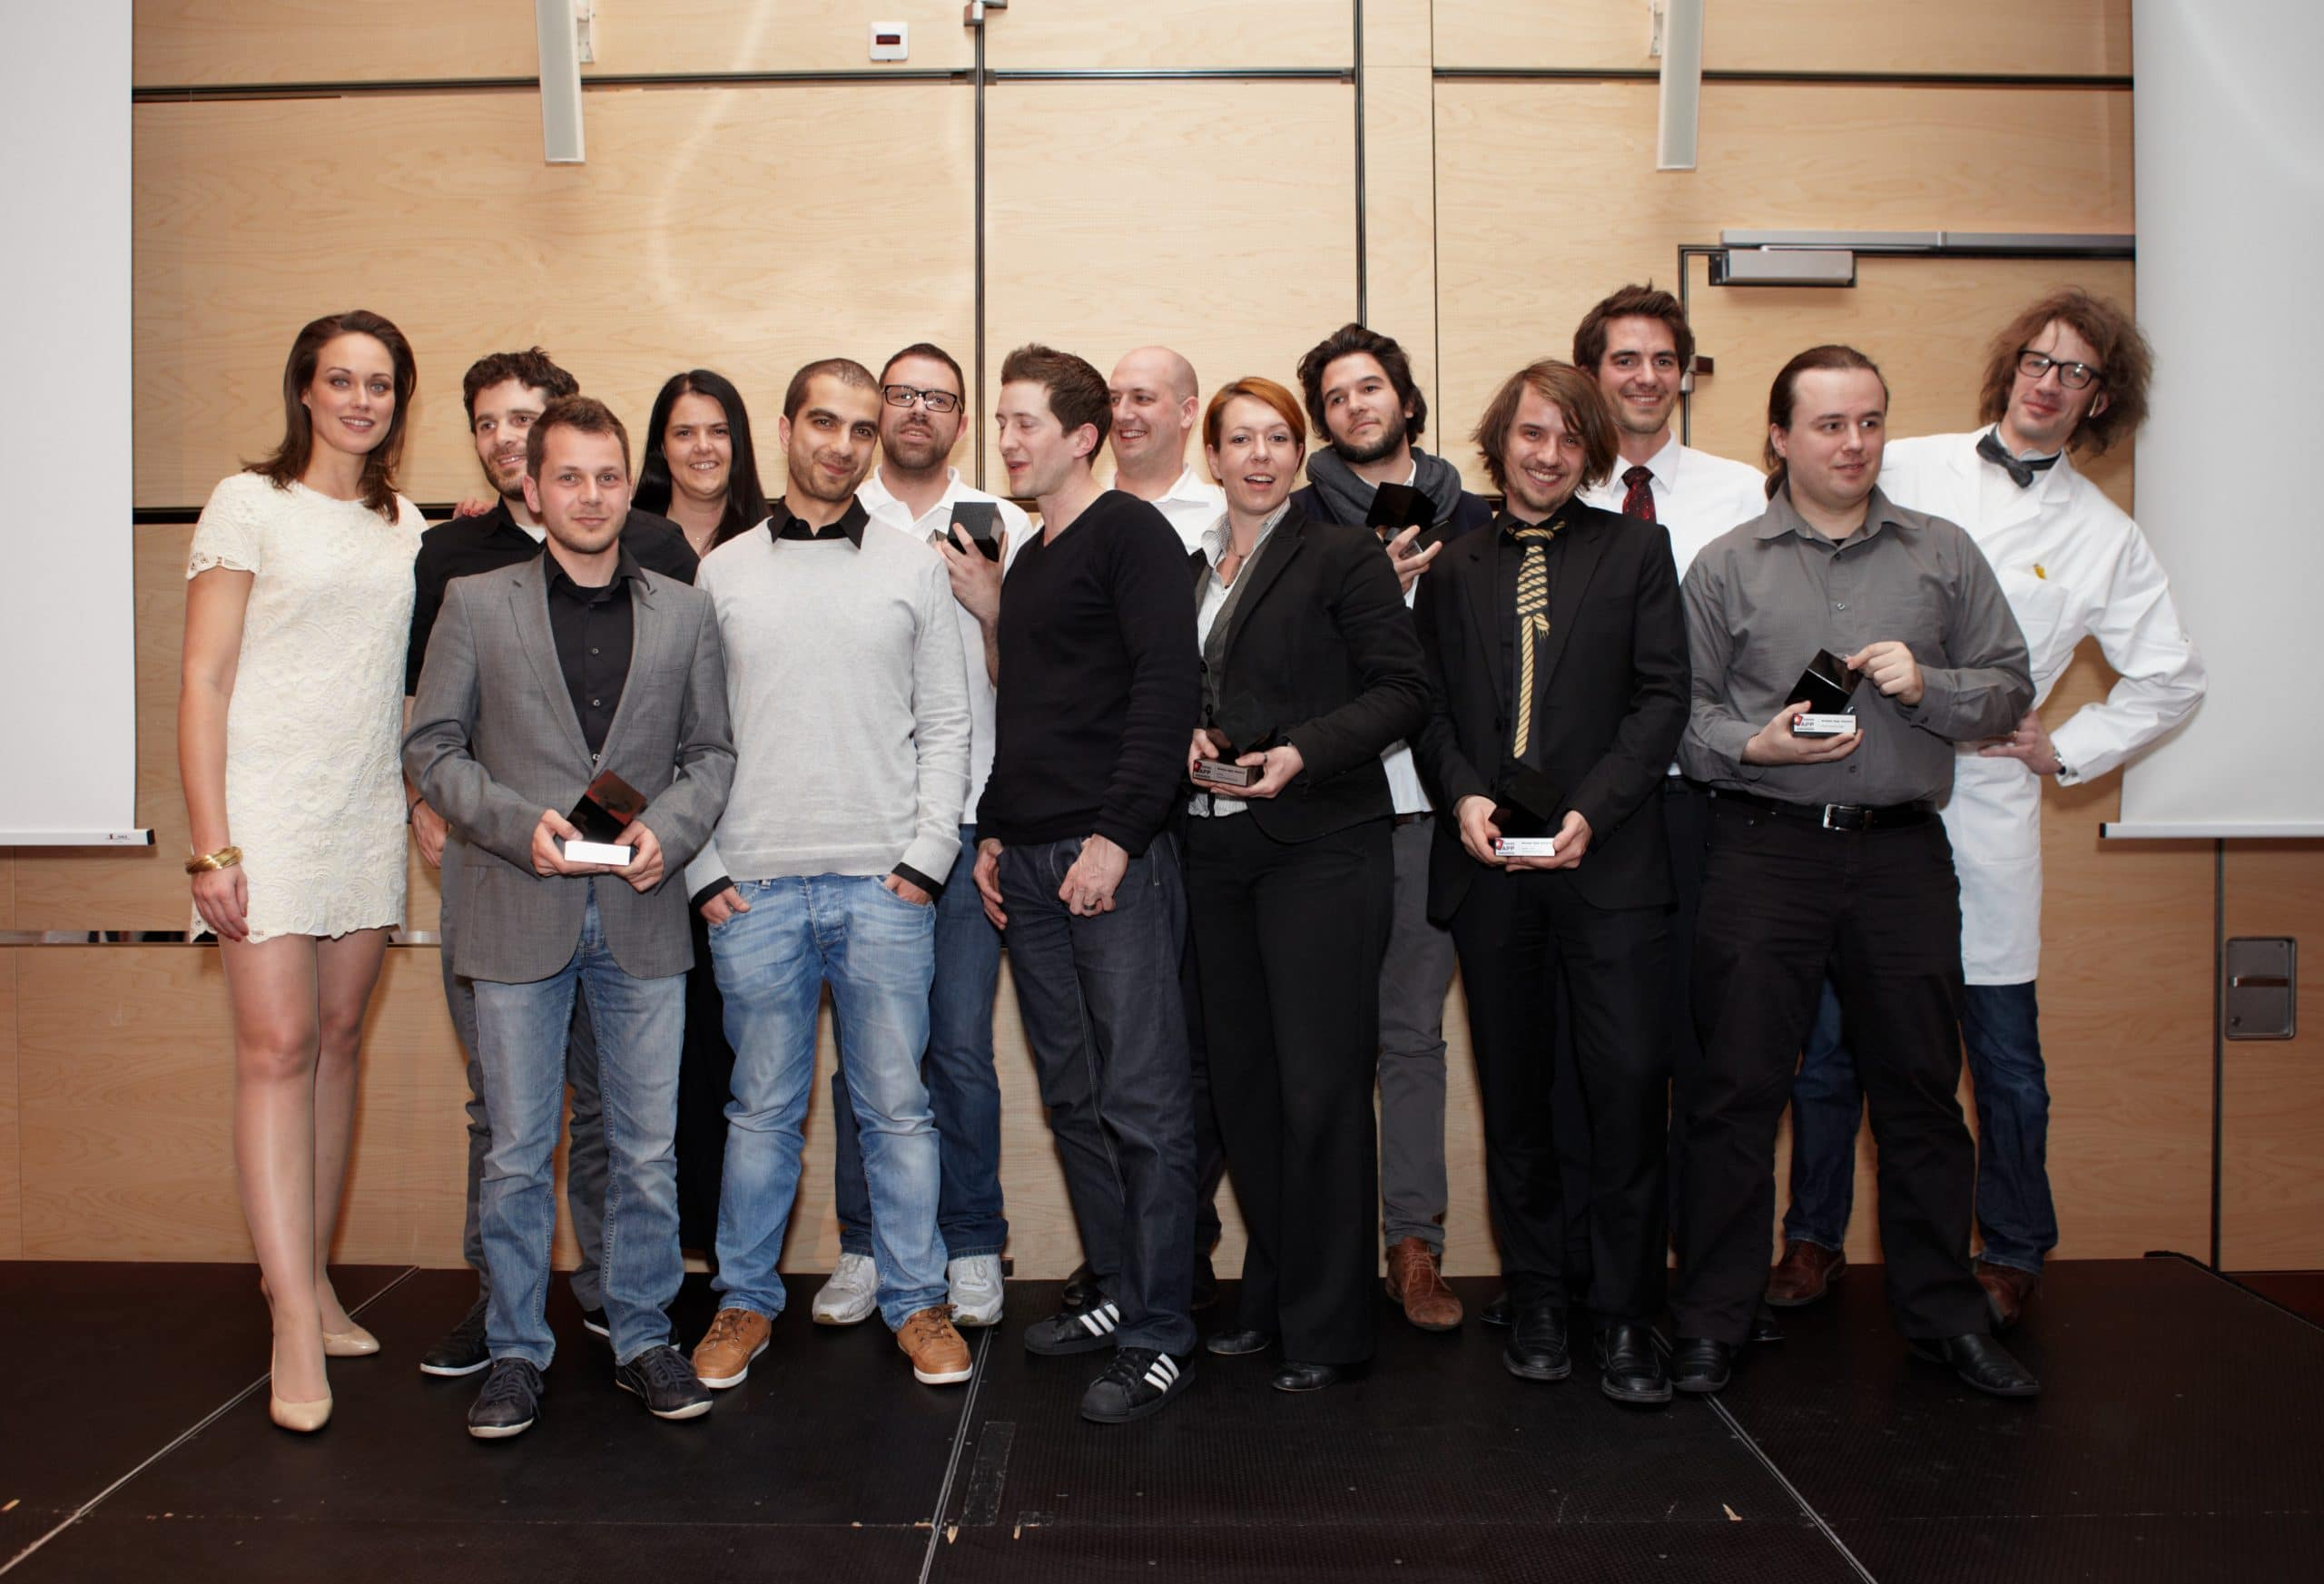 Gbanga with Pilotifant at the Swiss App Awards 2012